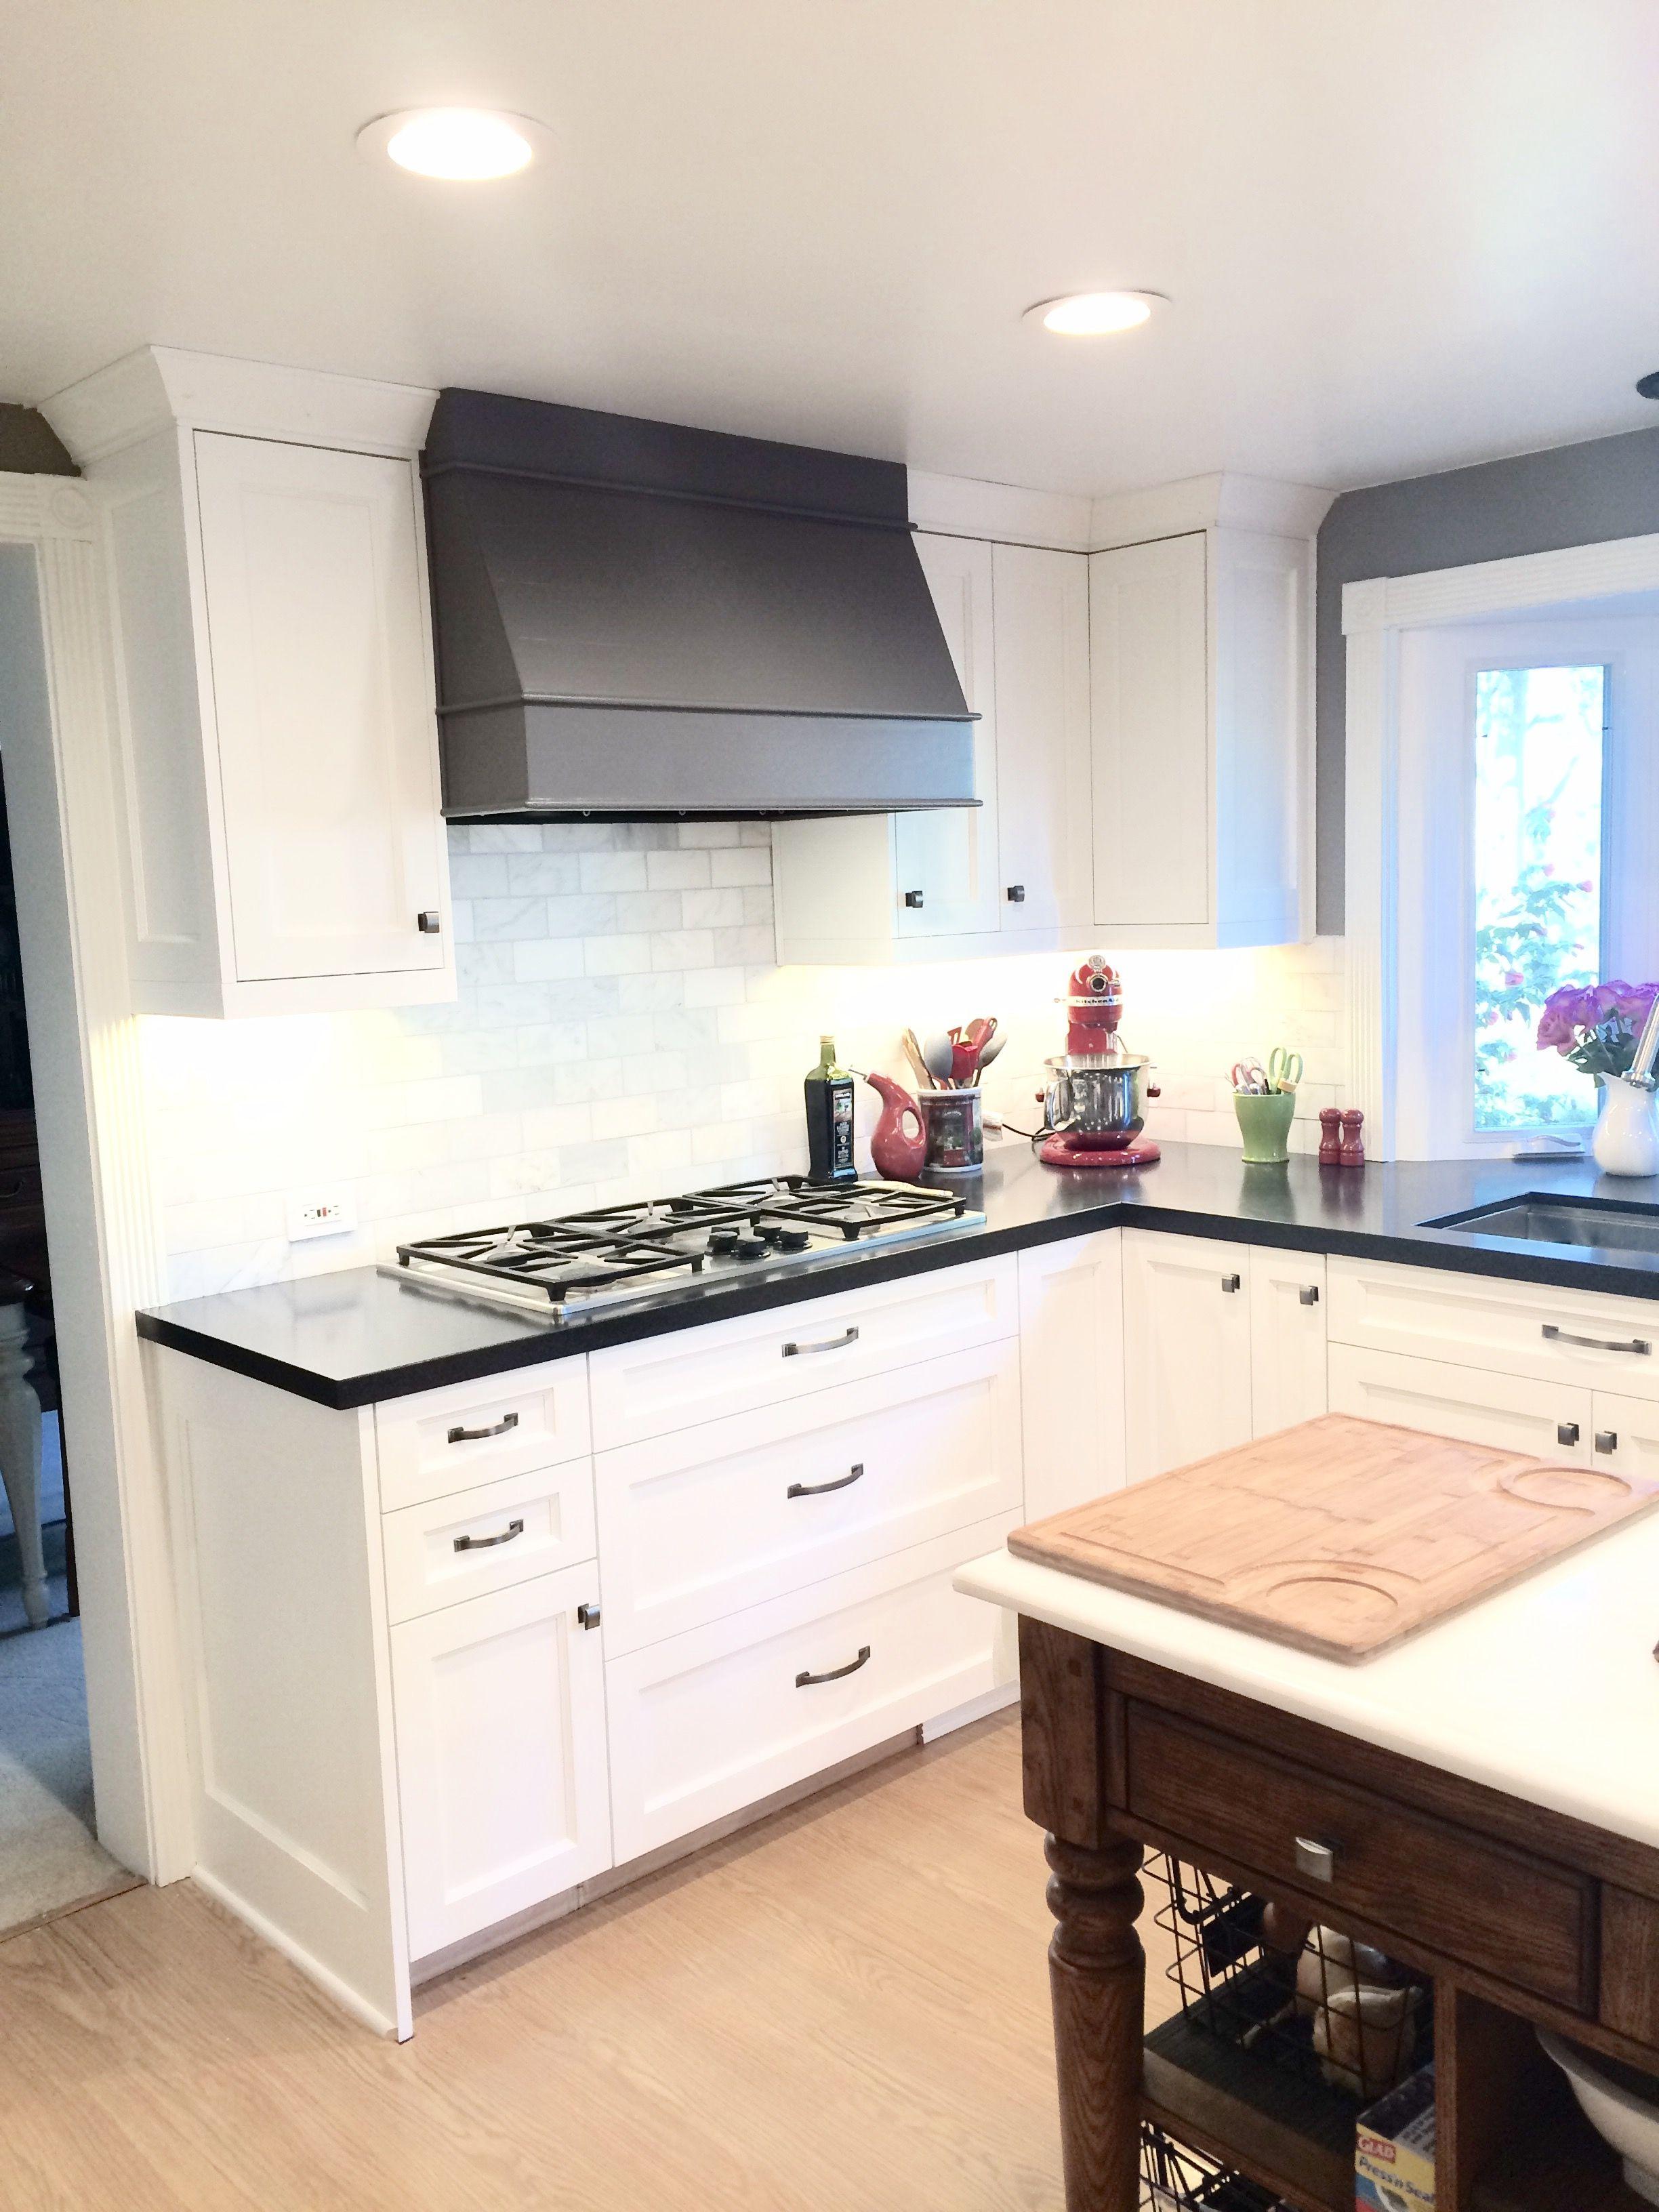 Barker Cabinets Shaker Style Painted Dover White Black Granite Countertop Di Black Kitchen Cabinets Kitchen Cabinet Design Kitchen Cabinets Black And White